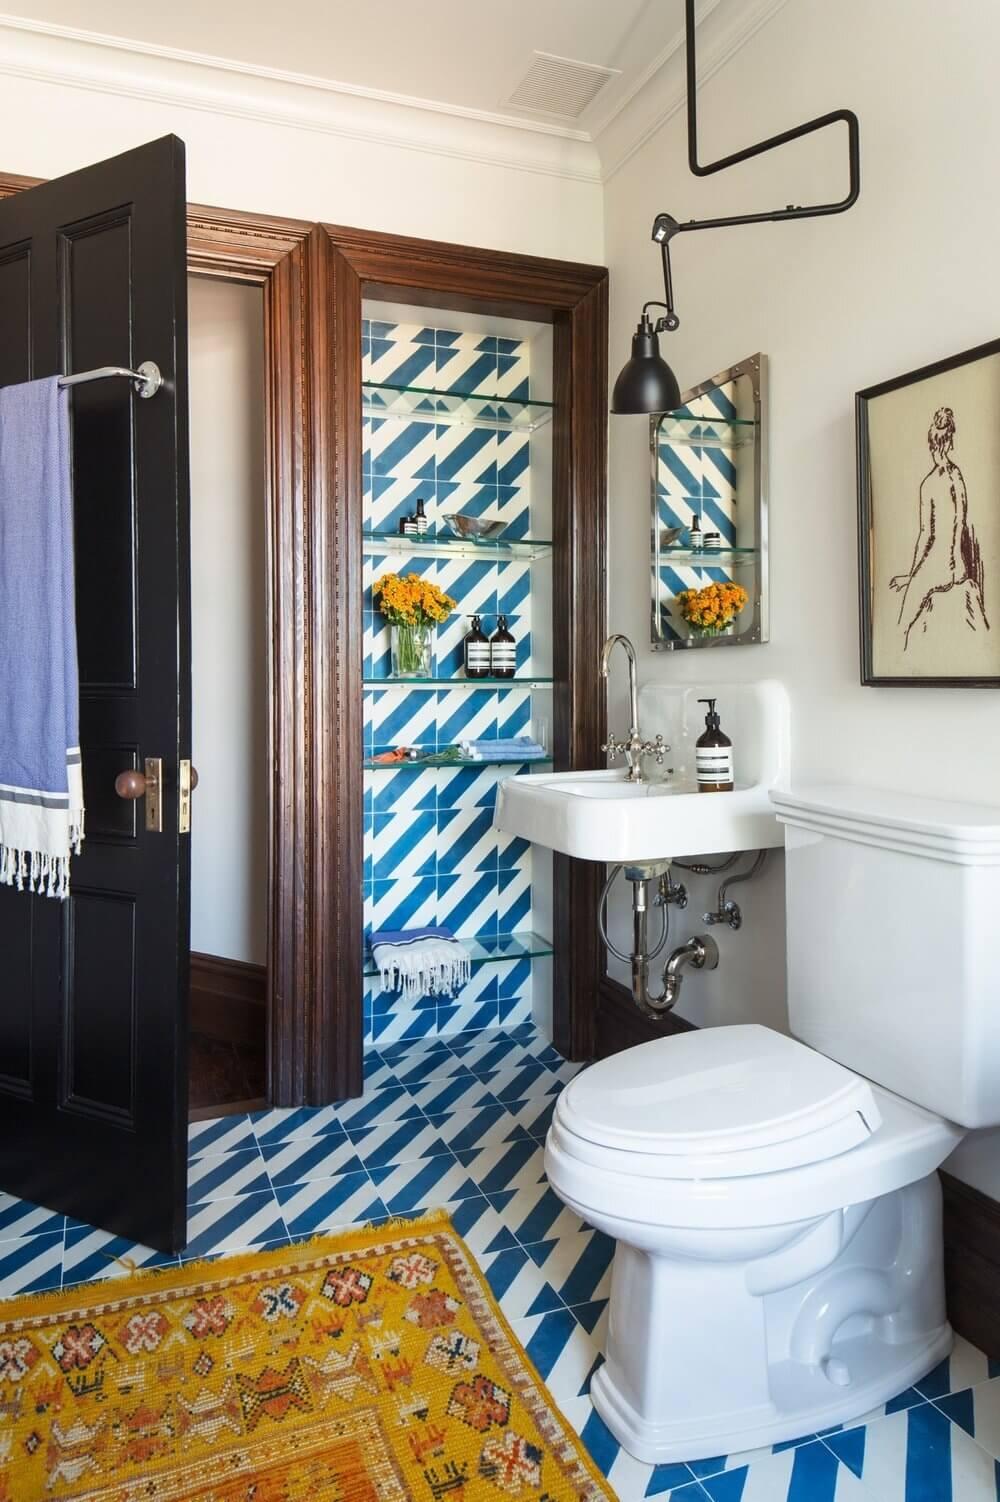 Inspiring Bathrooms With Geometric Tiles